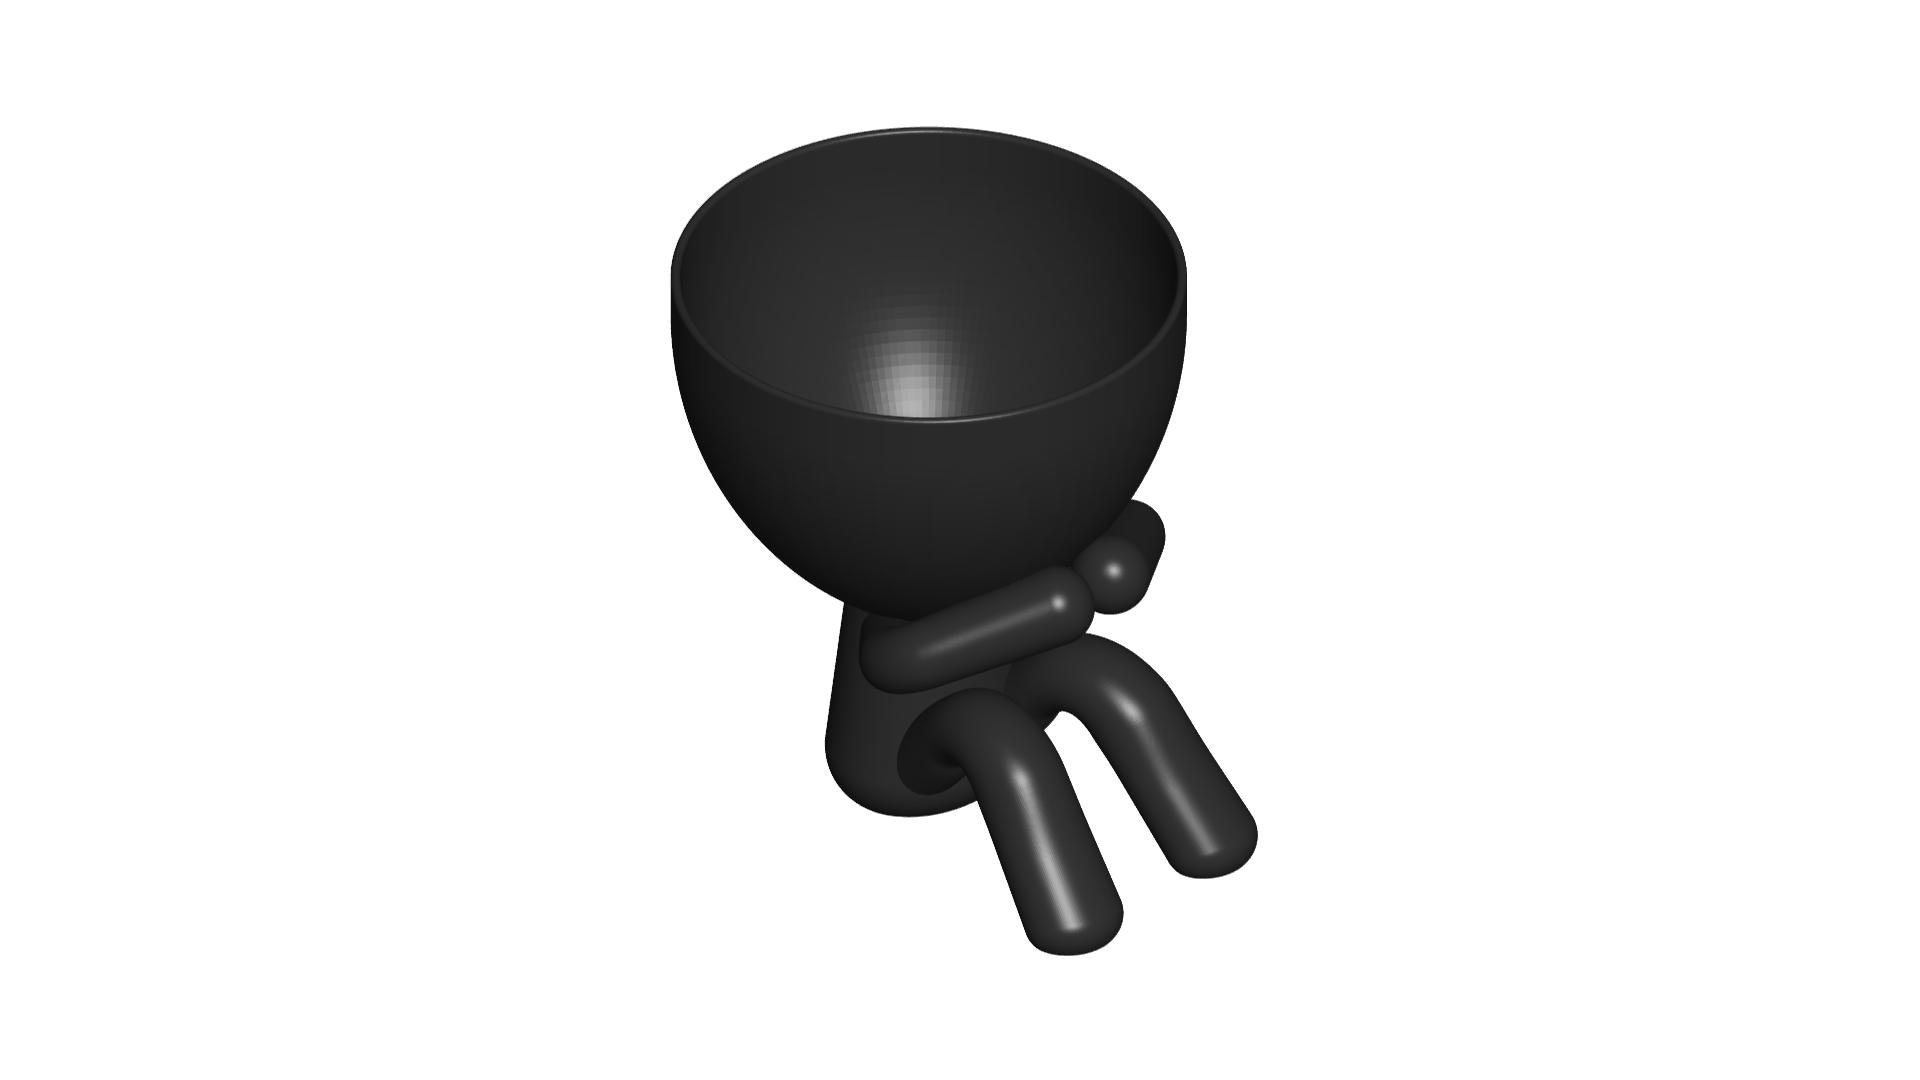 3_negro_2.png Download free STL file MACETA FLORERO ROBERT PLANT - POT GLASS ROBERT WISE I DO NOT SPEAK • 3D printer design, PRODUSTL56